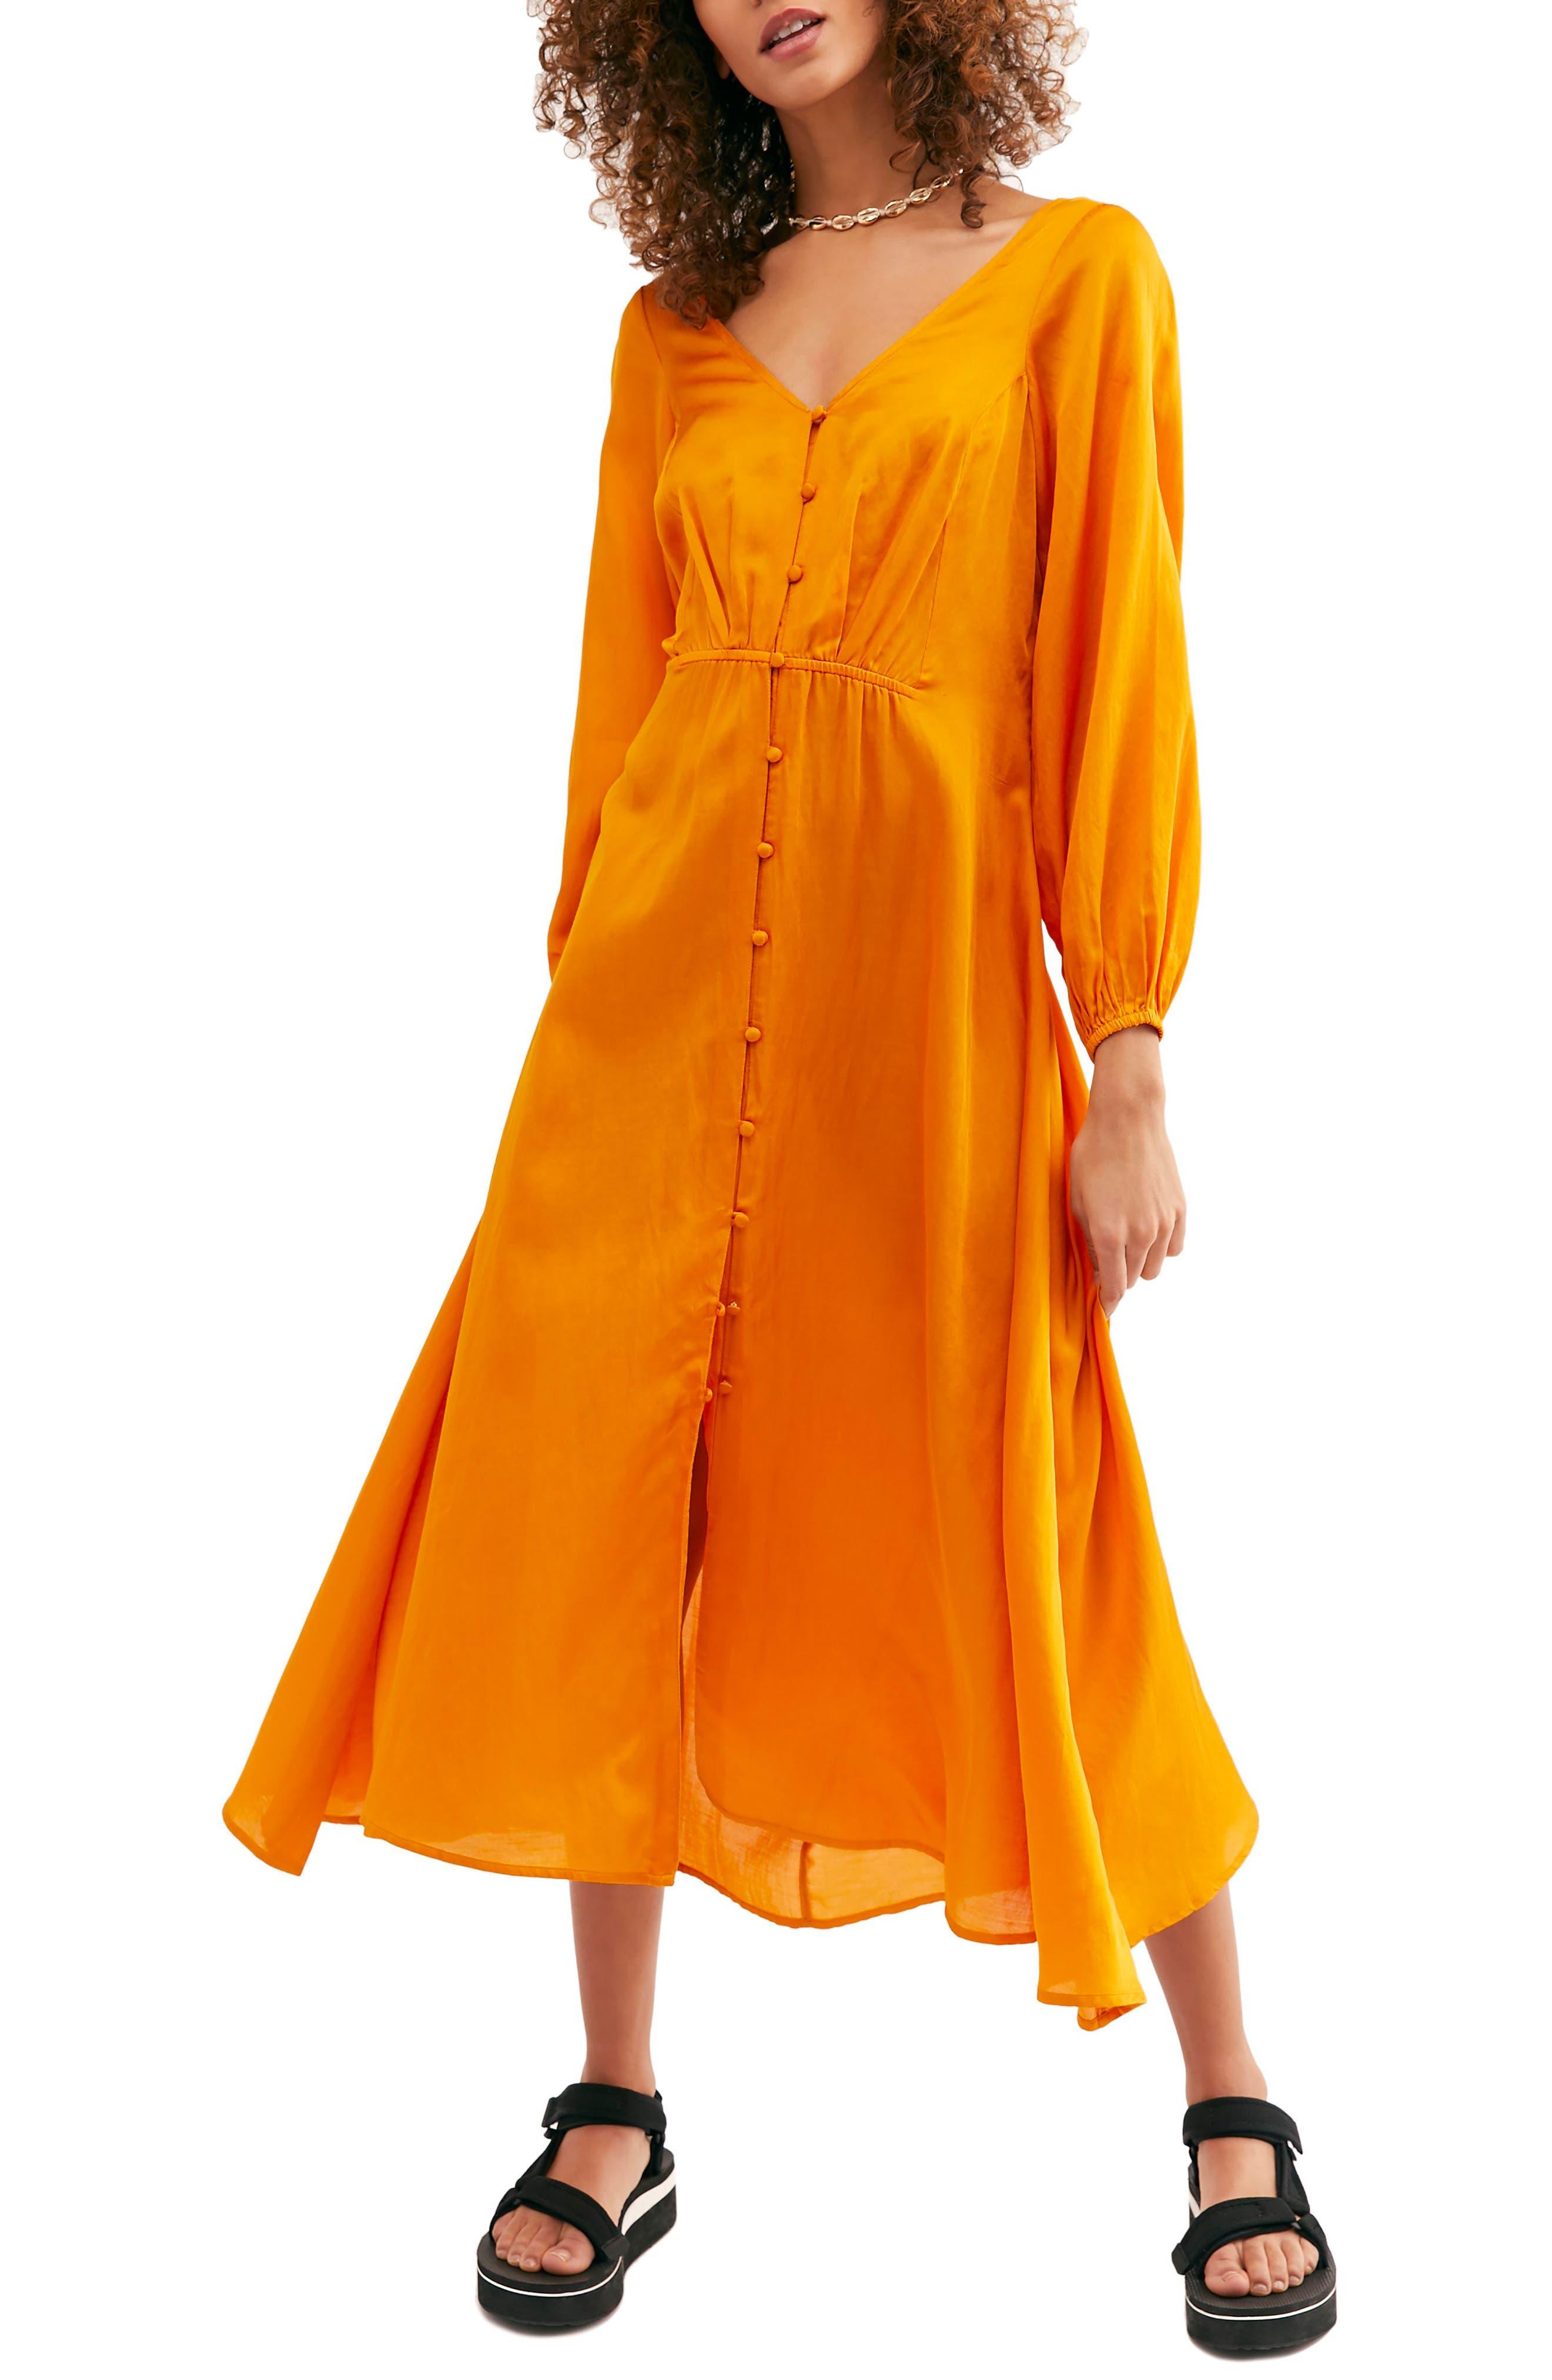 Free People Later Days Midi Dress, Orange